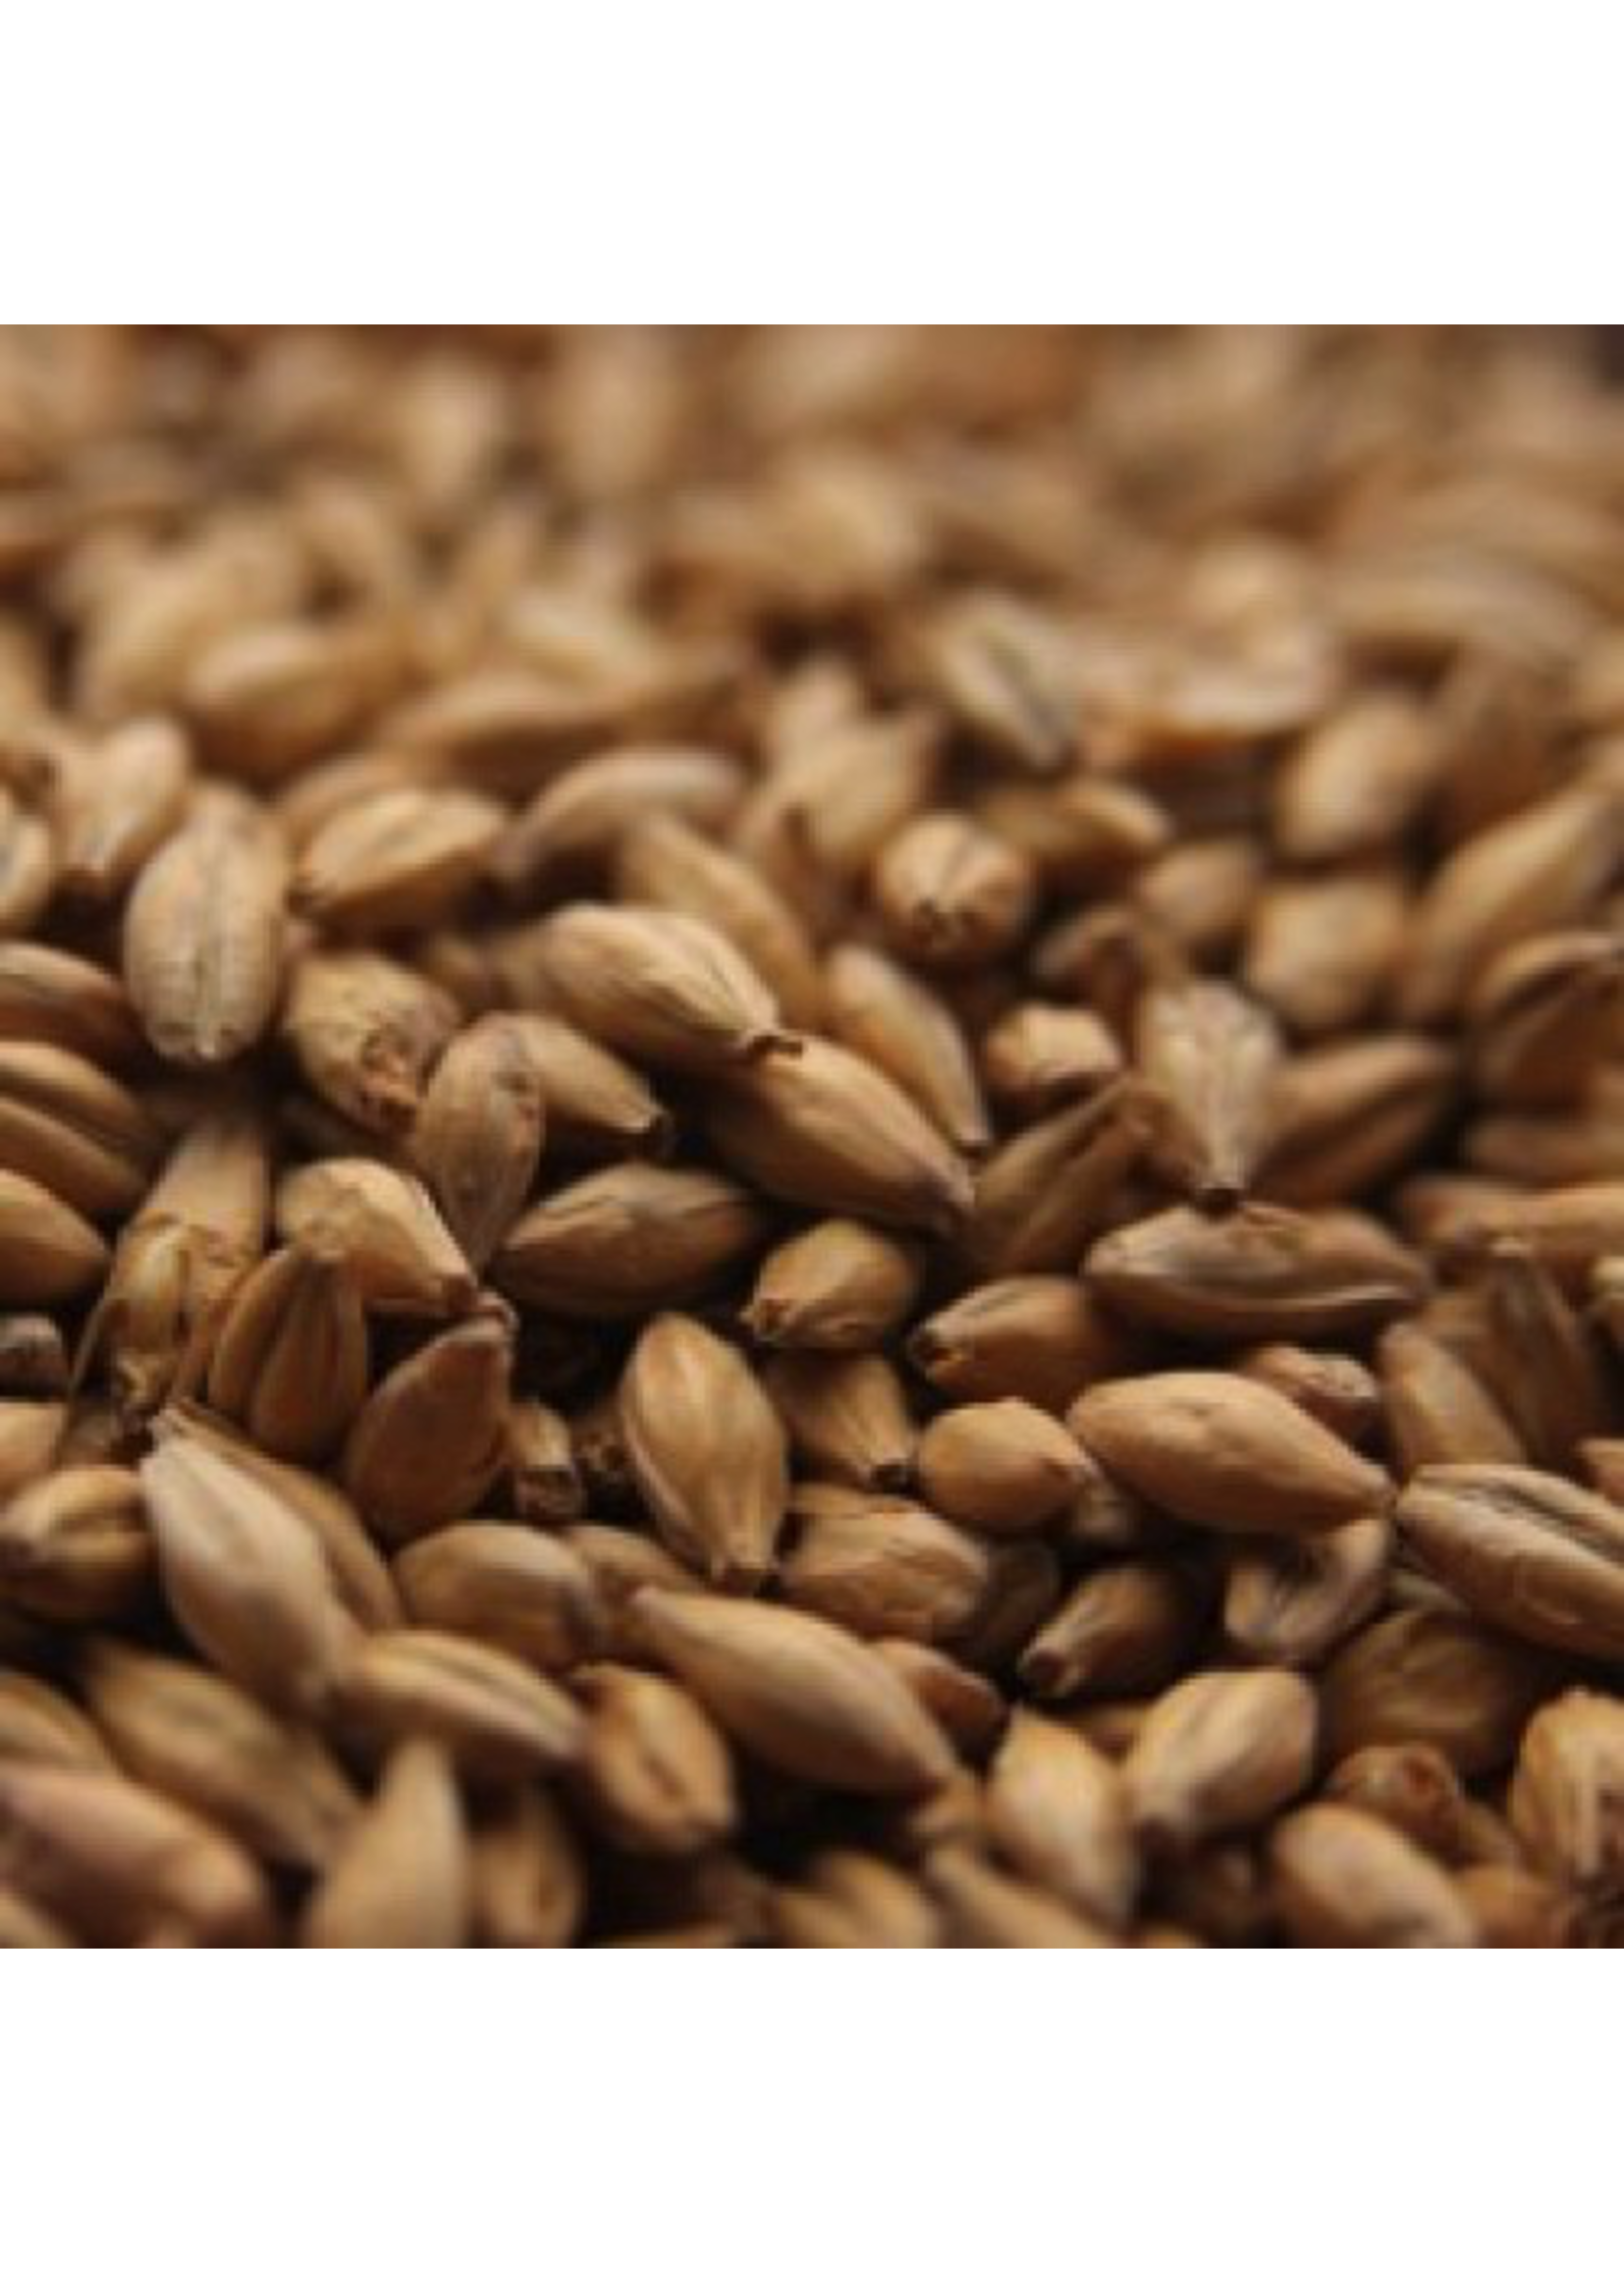 Grain Avangard Malz Premium Pale Ale Malt - A3 - 1 LB